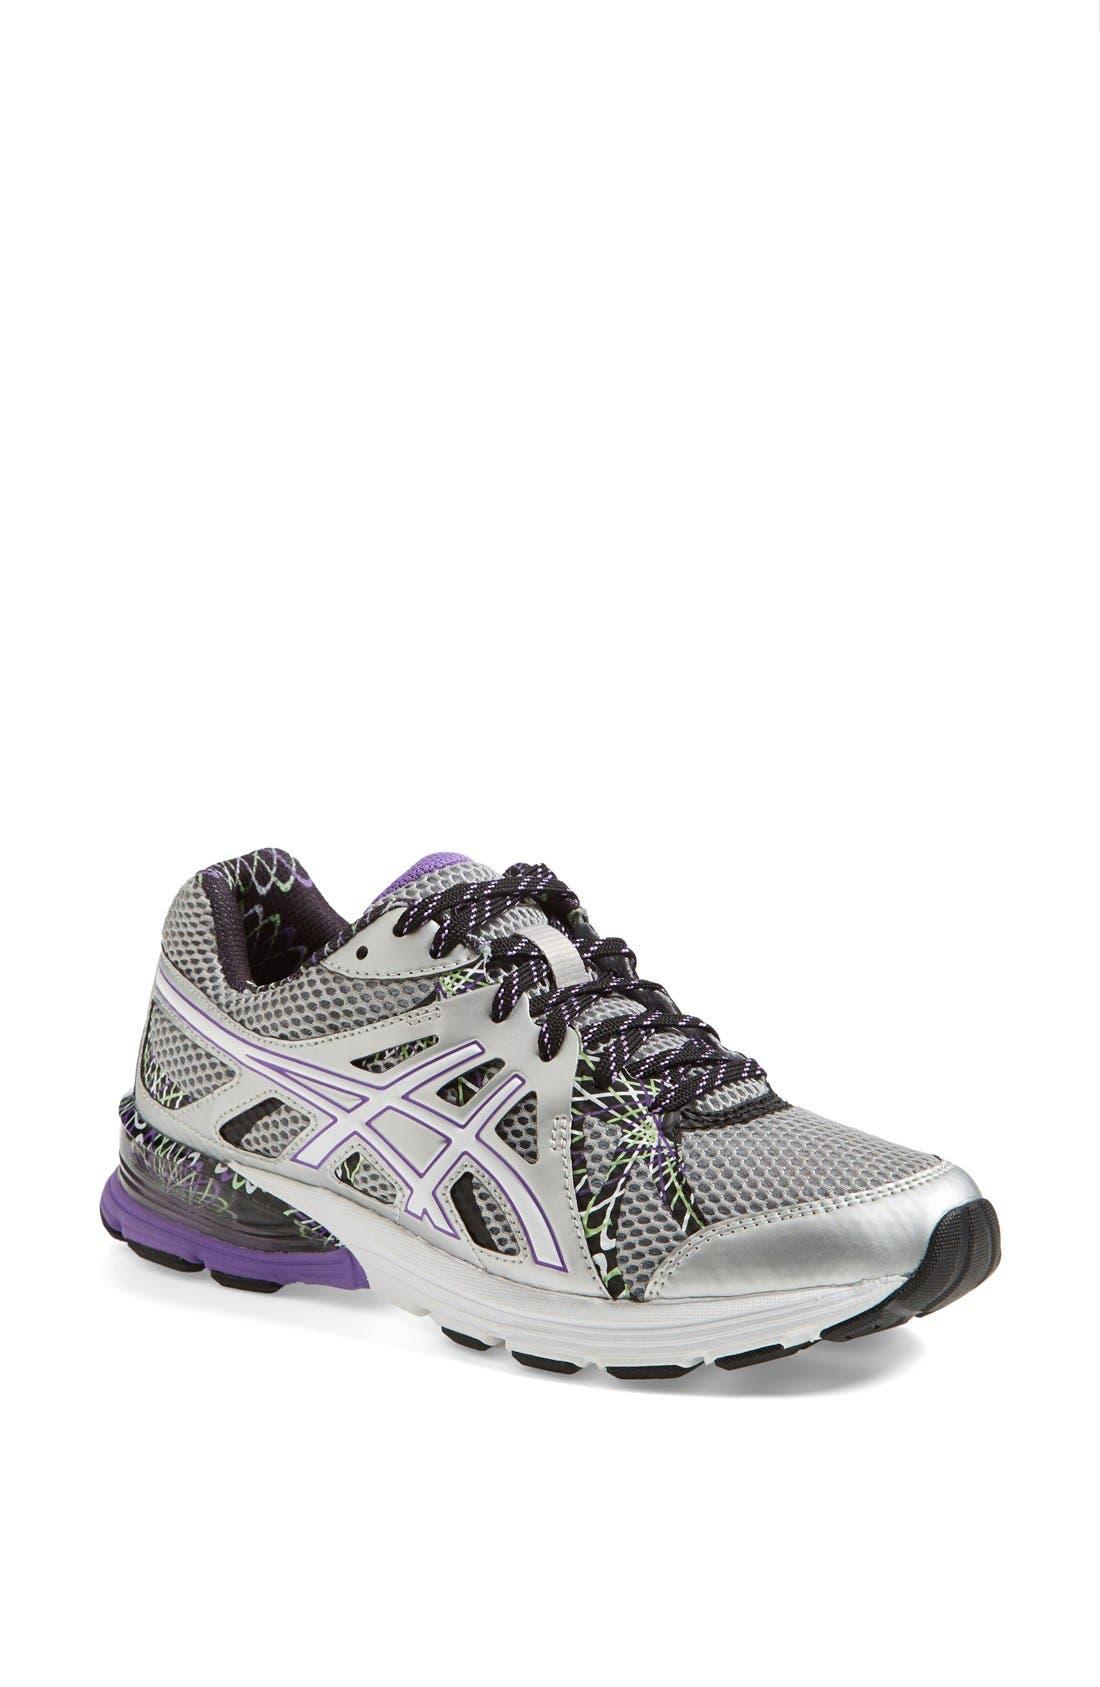 Alternate Image 1 Selected - ASICS® 'GEL-Preleus™' Running Shoe (Nordstrom Exclusive) (Women)